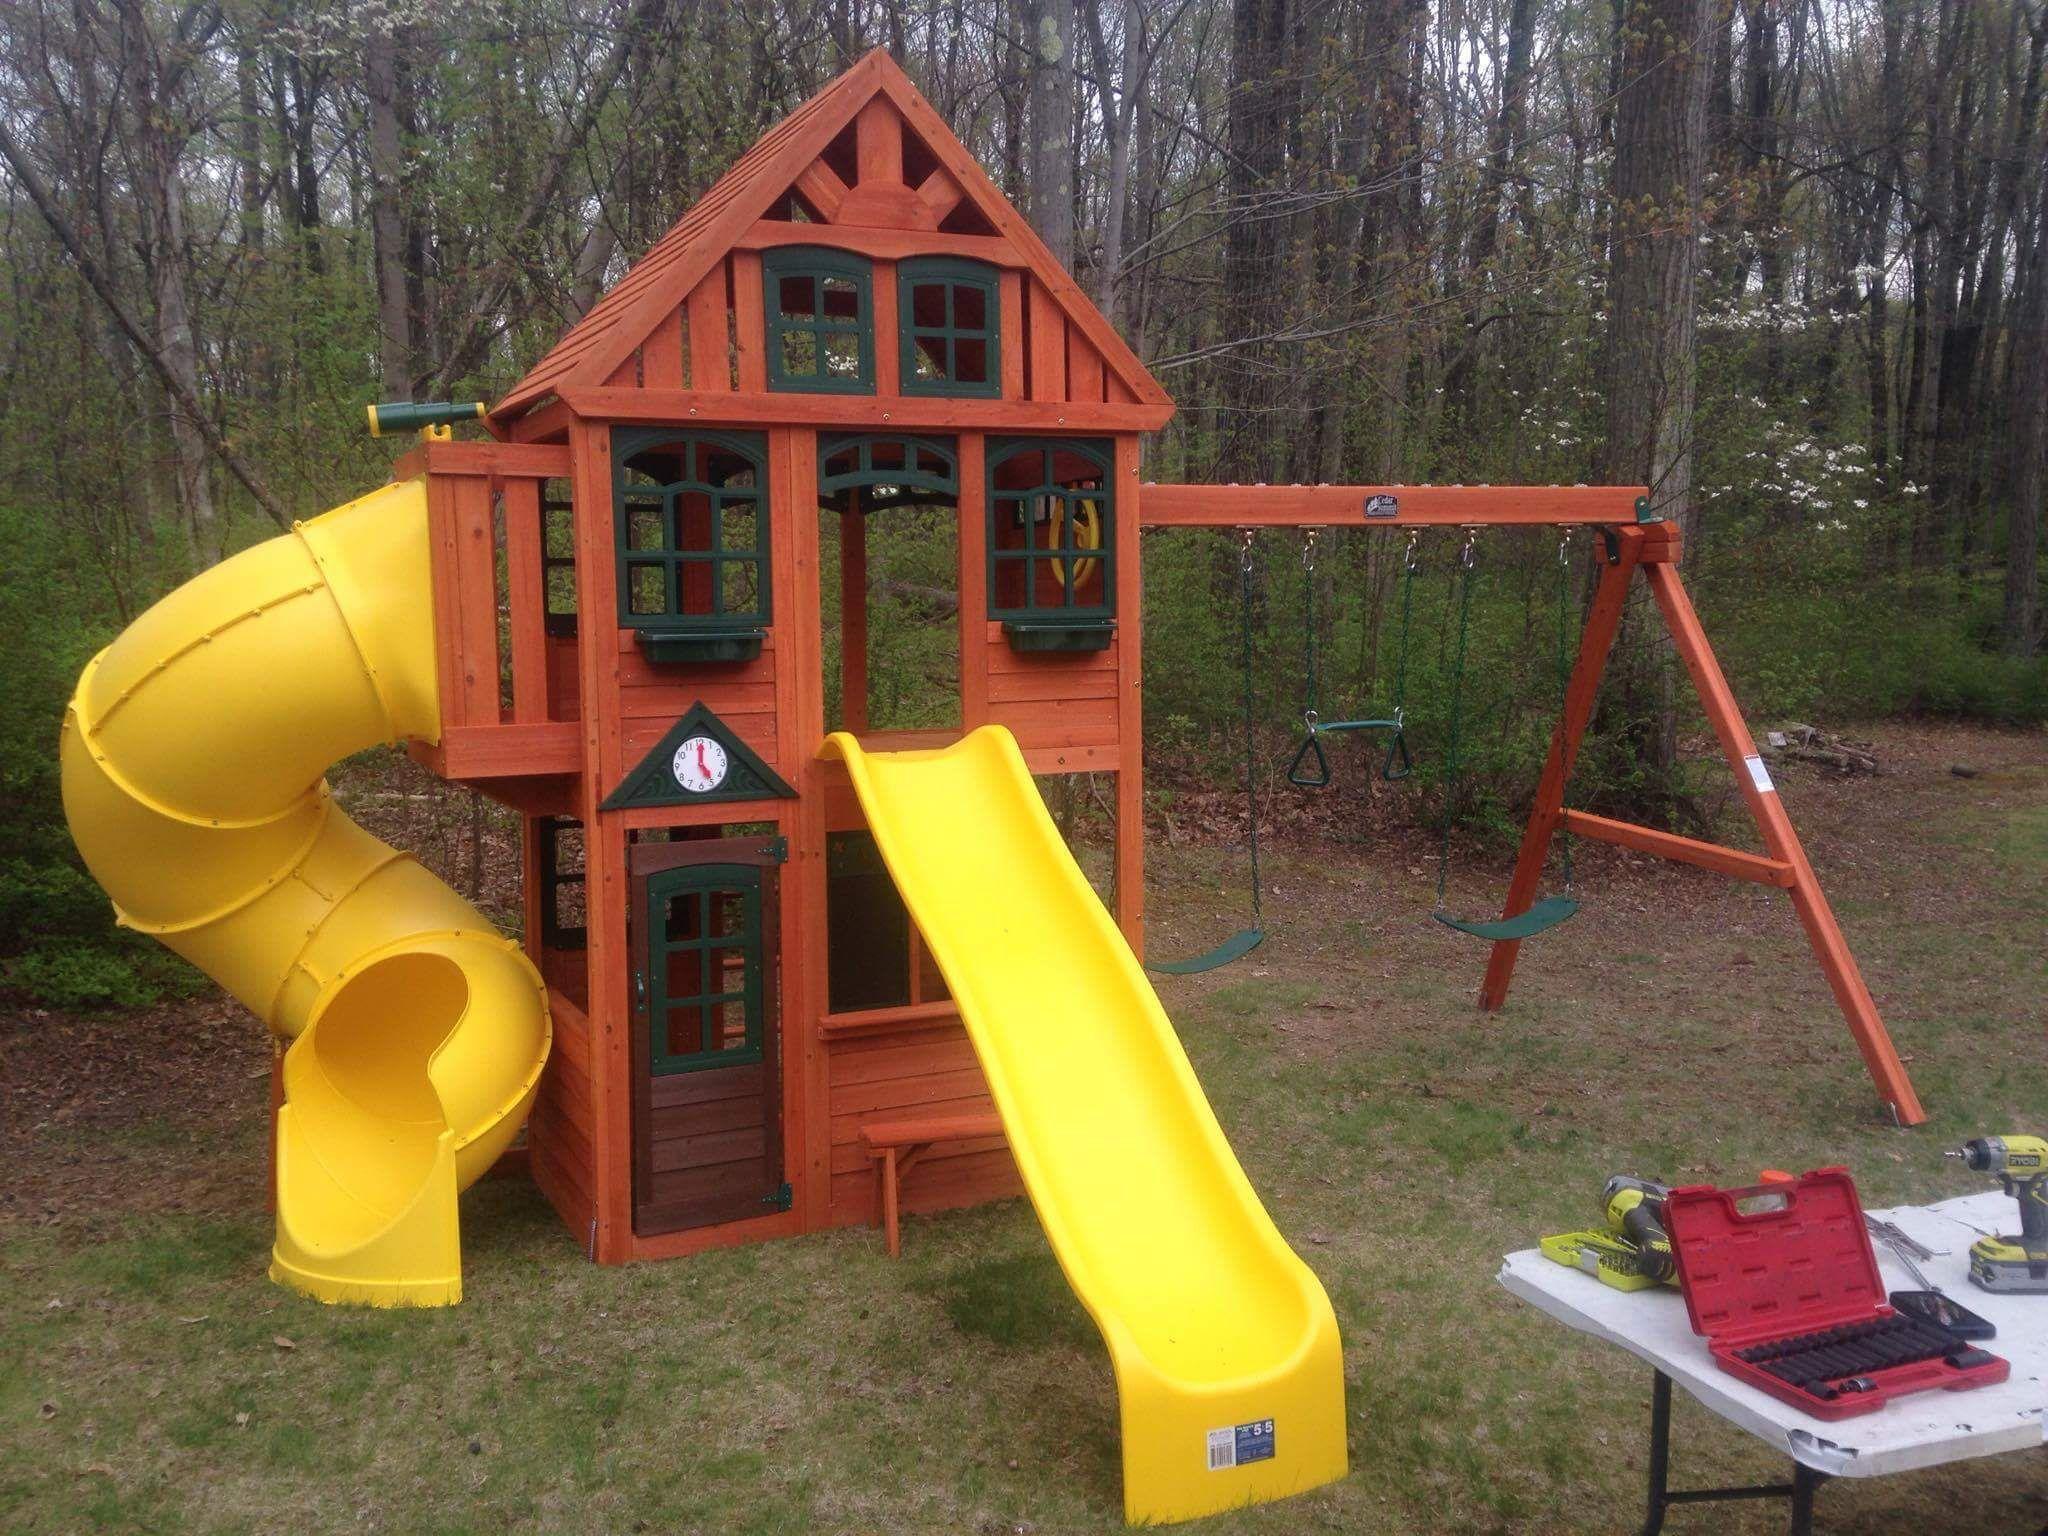 5 23 17 big backyard falcon ridge in sparta nj gym and play